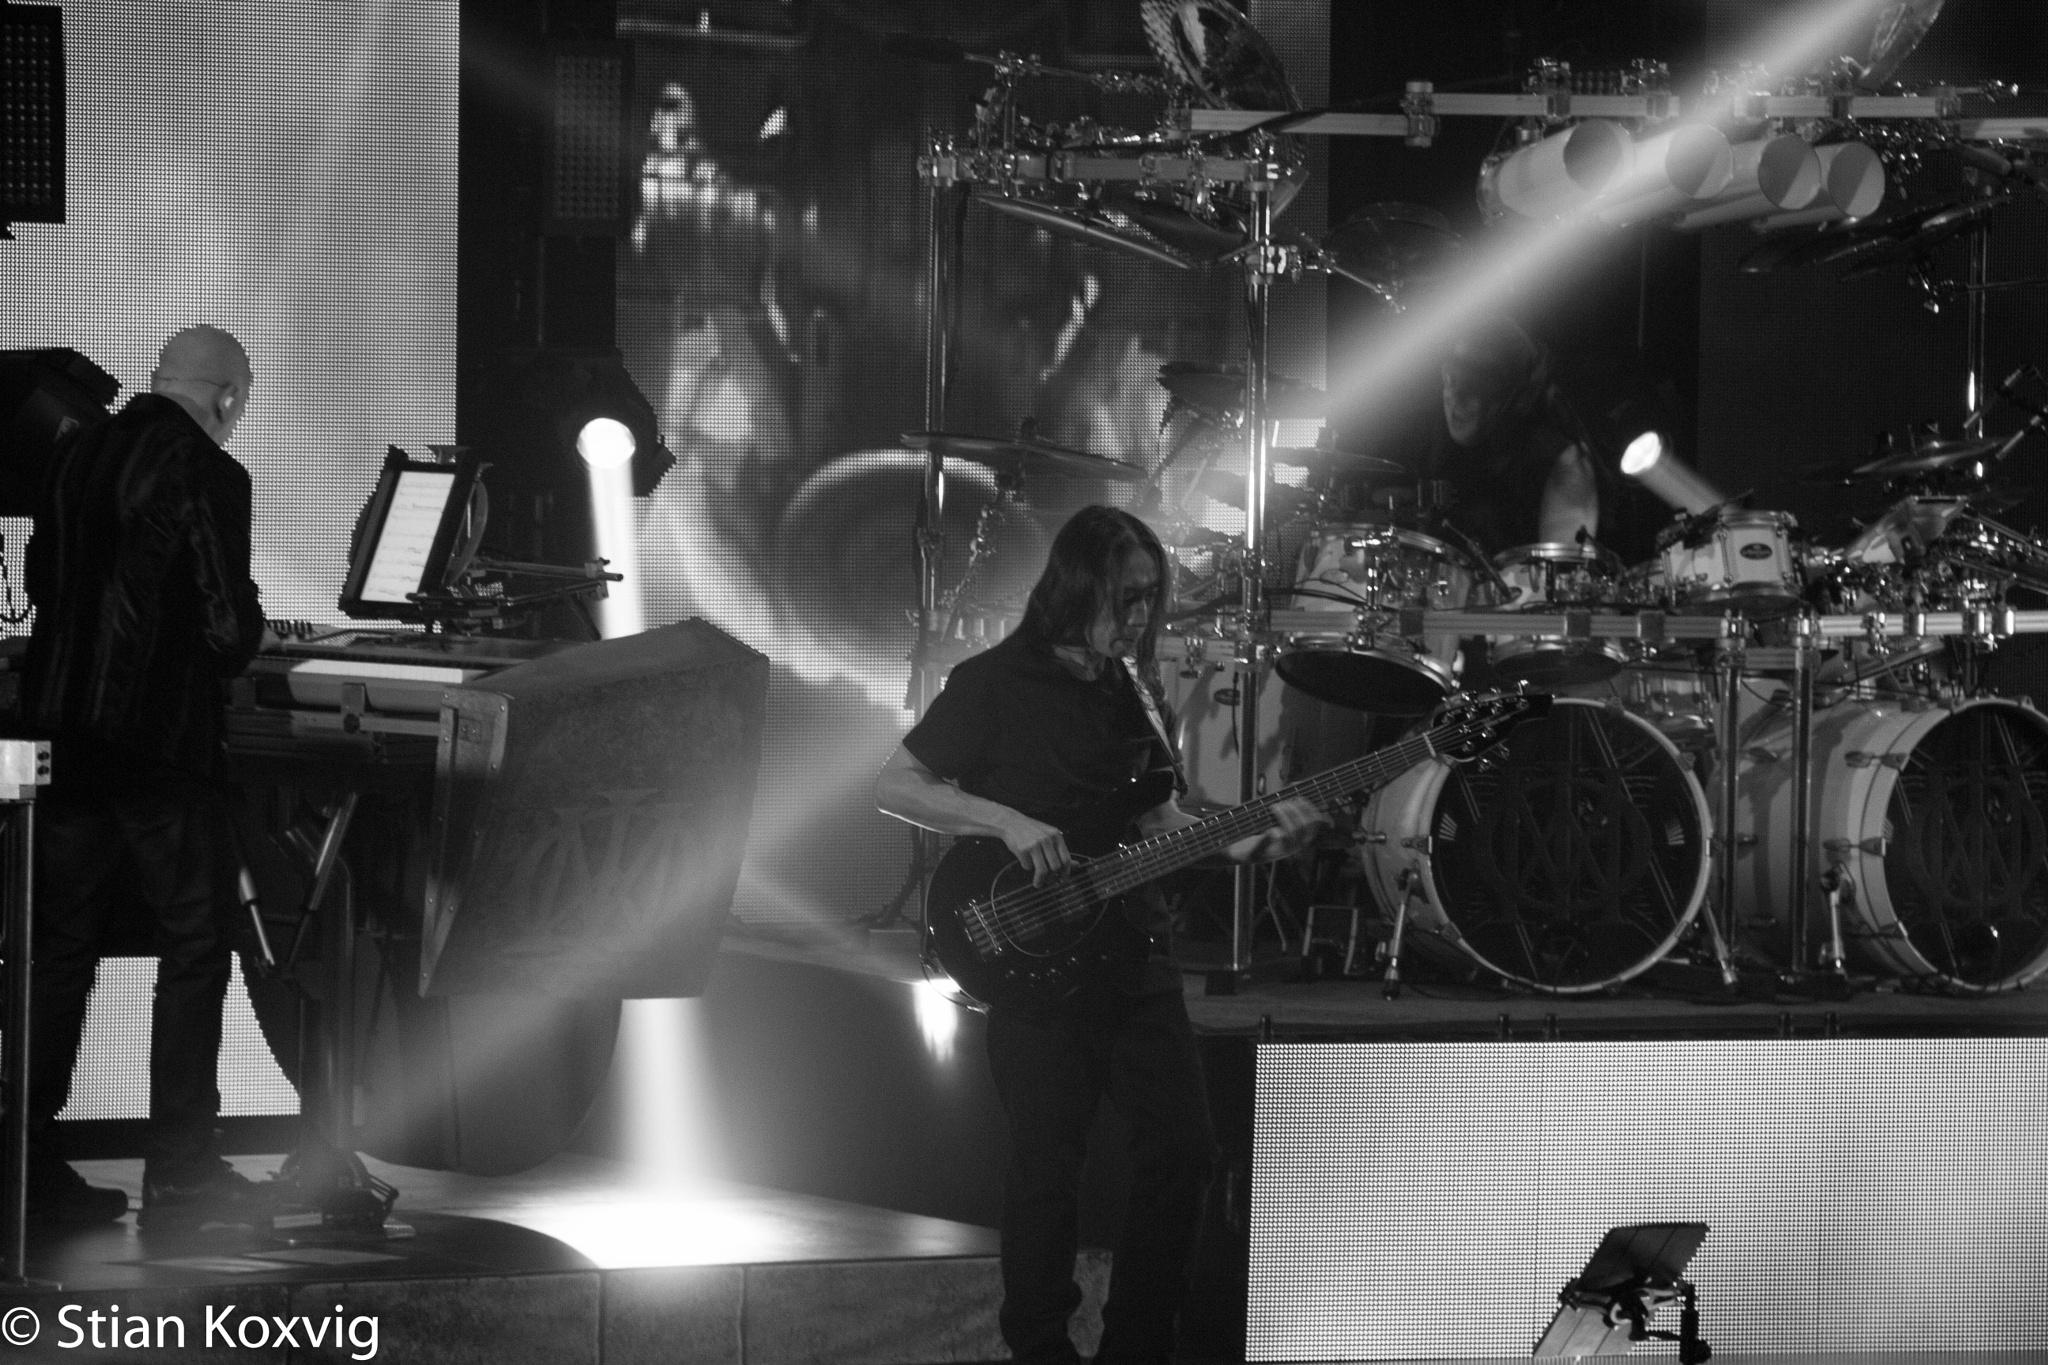 John Myung, Mike Mangini and Jordan Rudess. Live at Oslo Concert Hall by Stian Koxvig